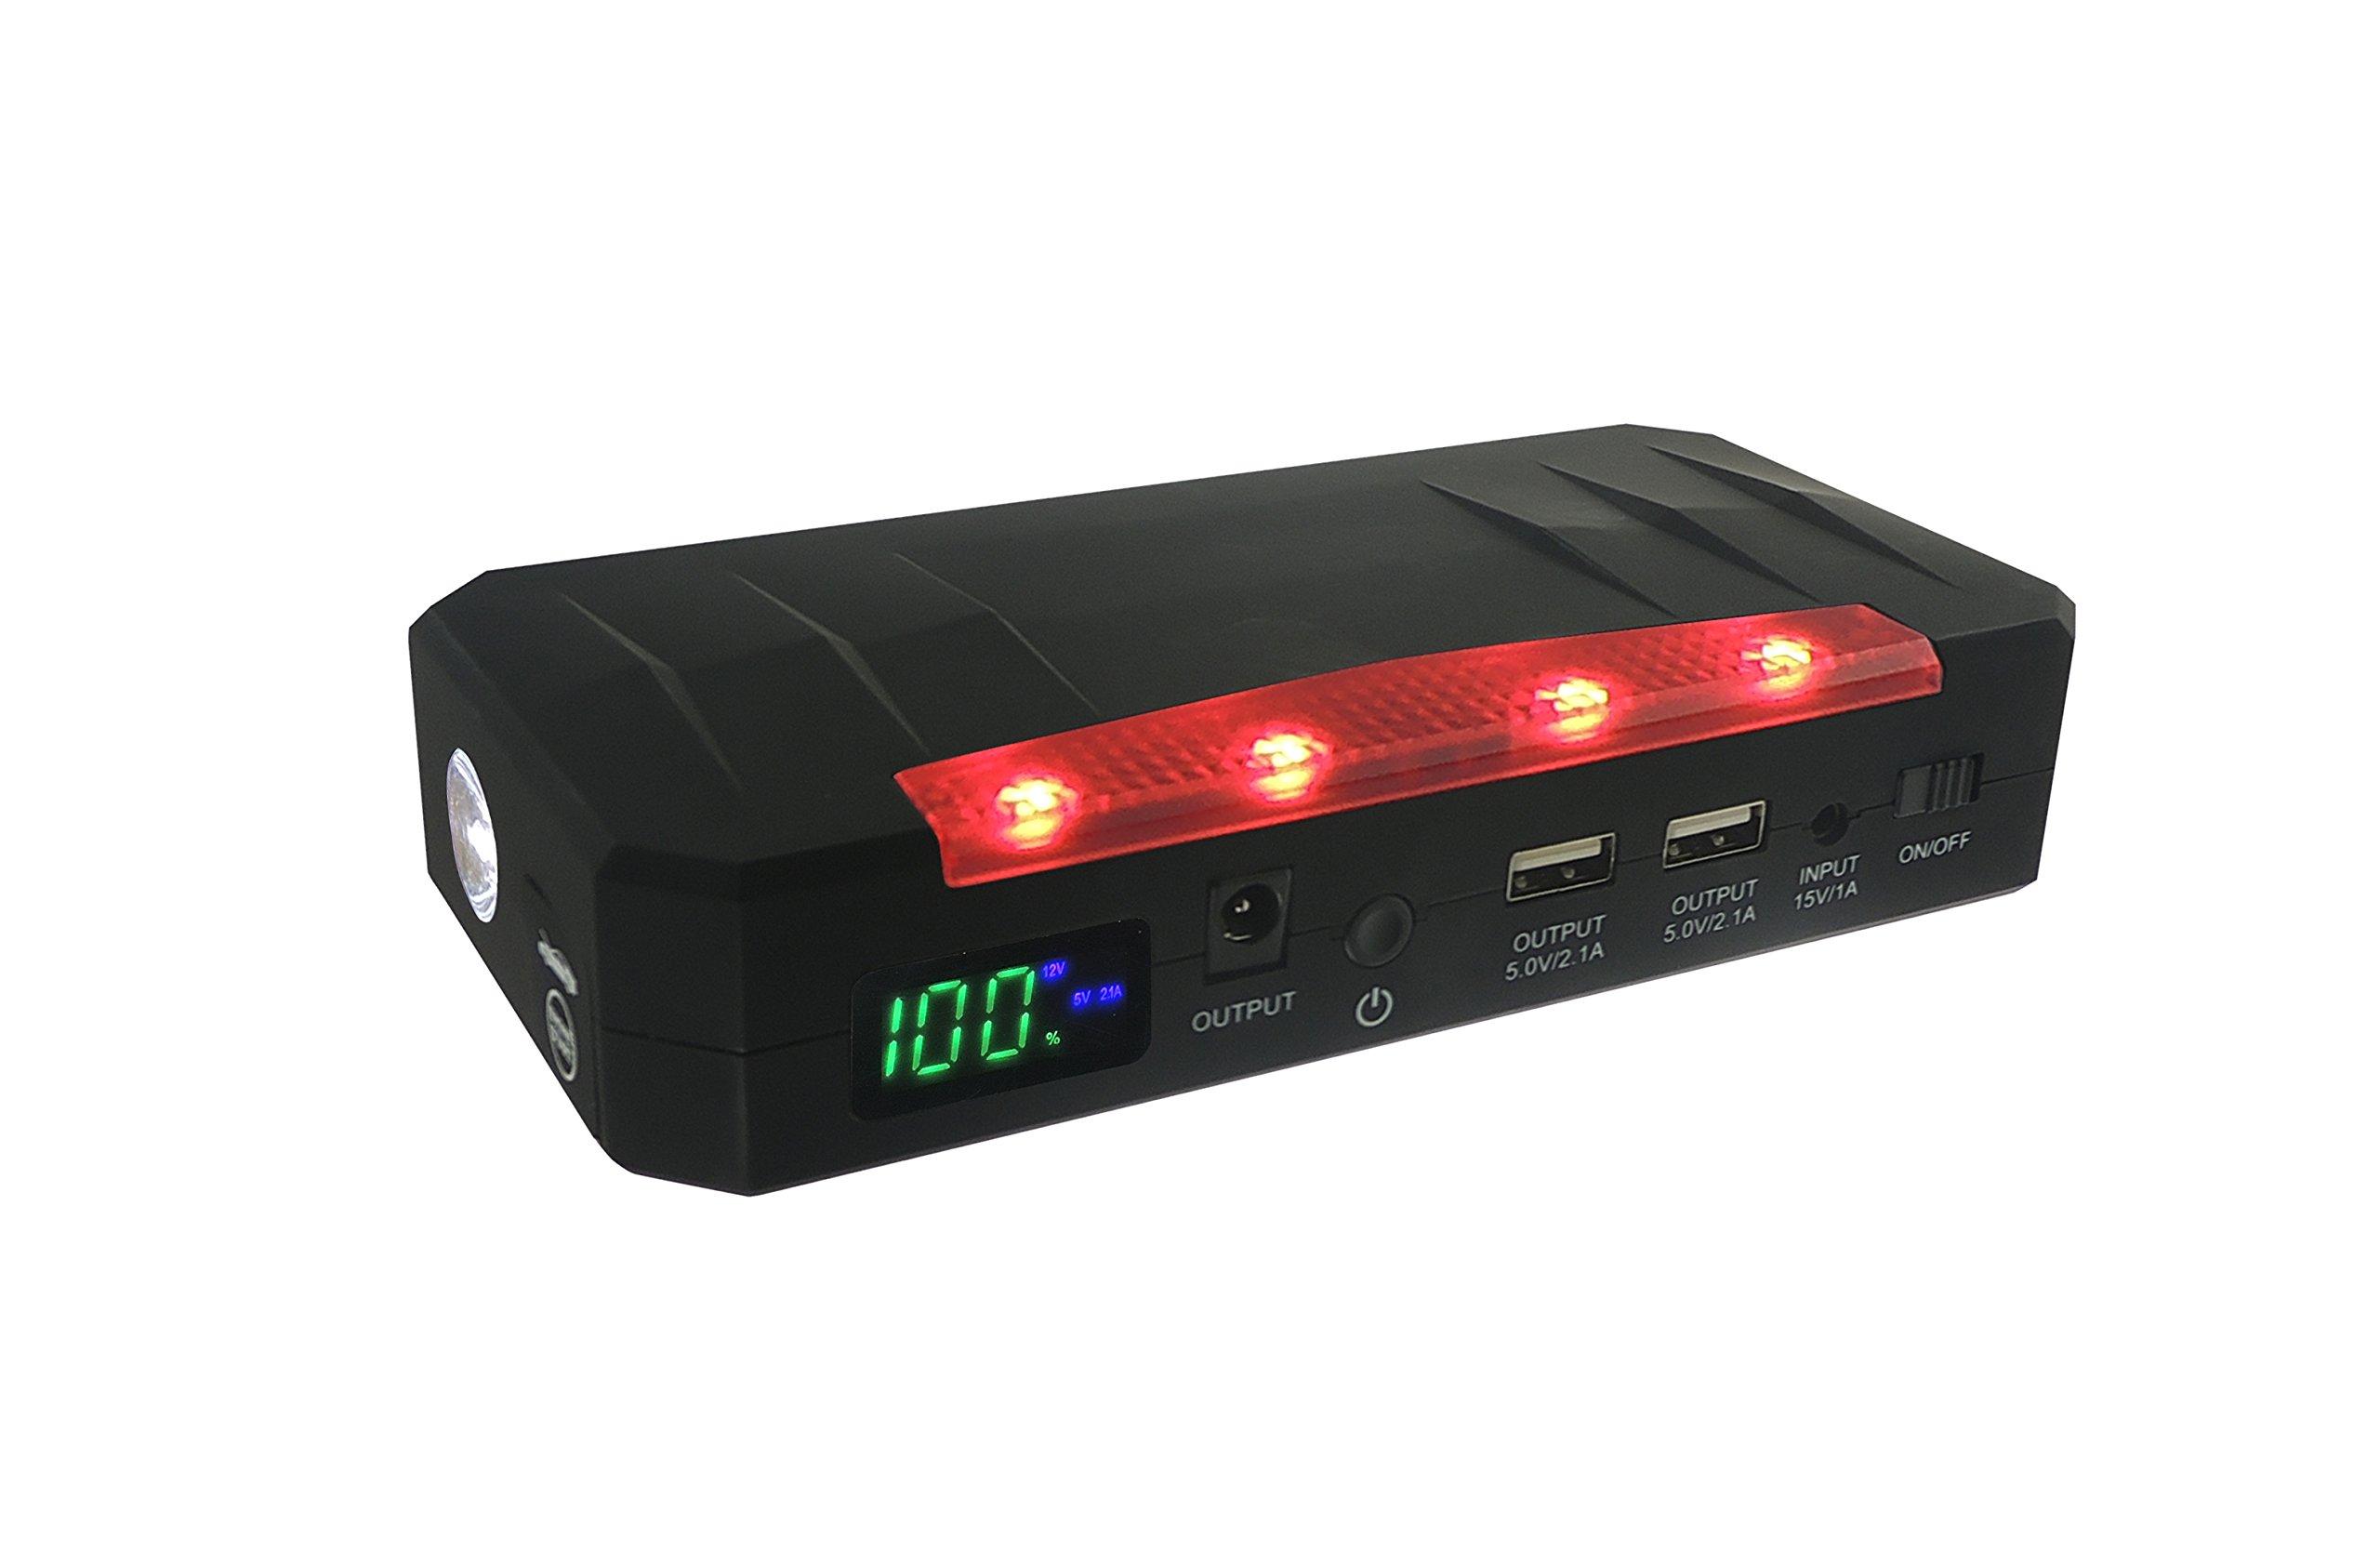 BFXenon Jumper21000 Black Premium Portable Jump Starter/Power Bank (21000 mAh)